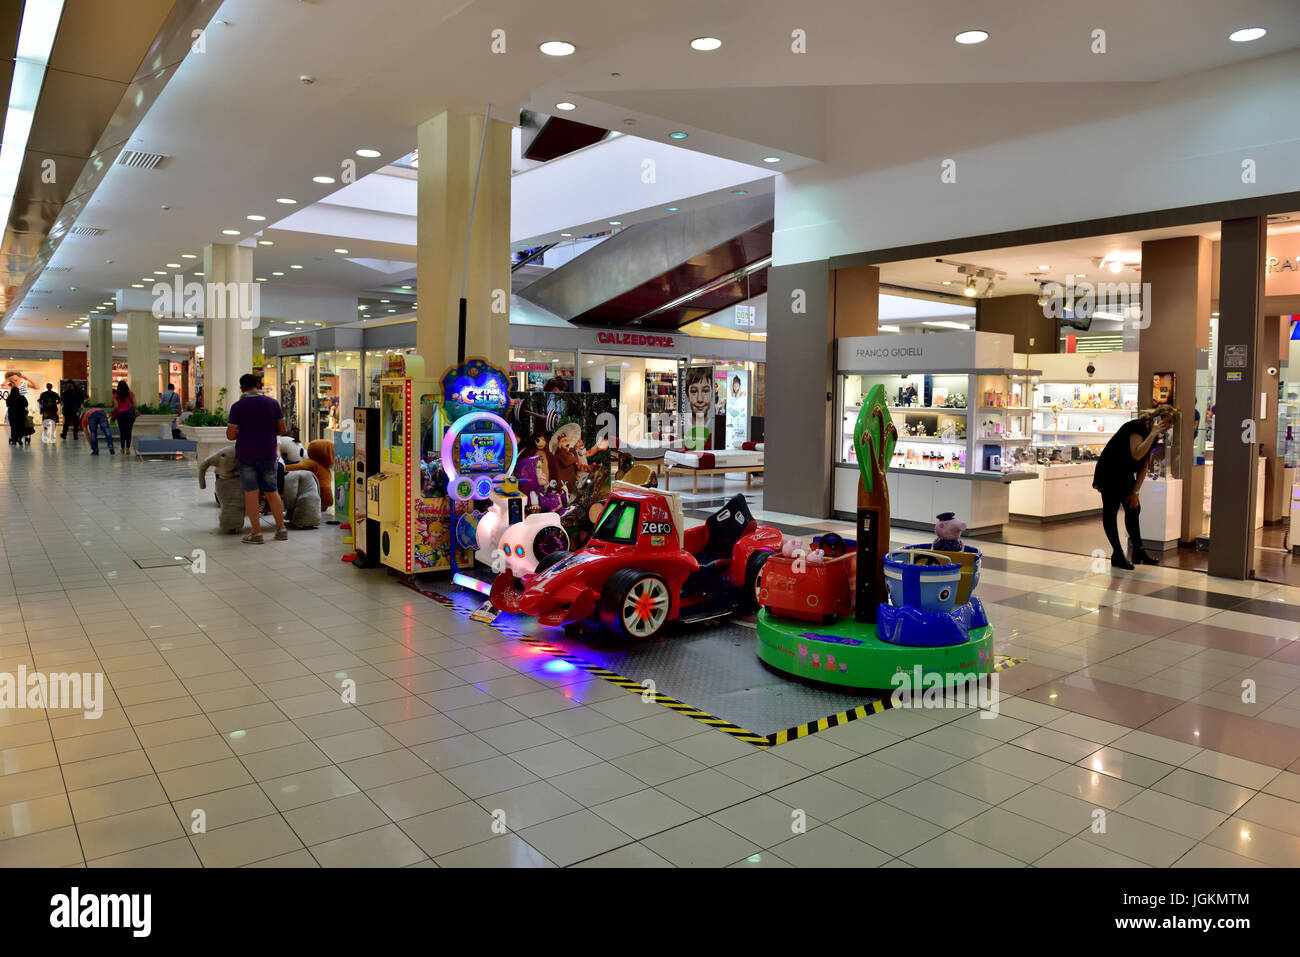 centro commerciale - photo #35